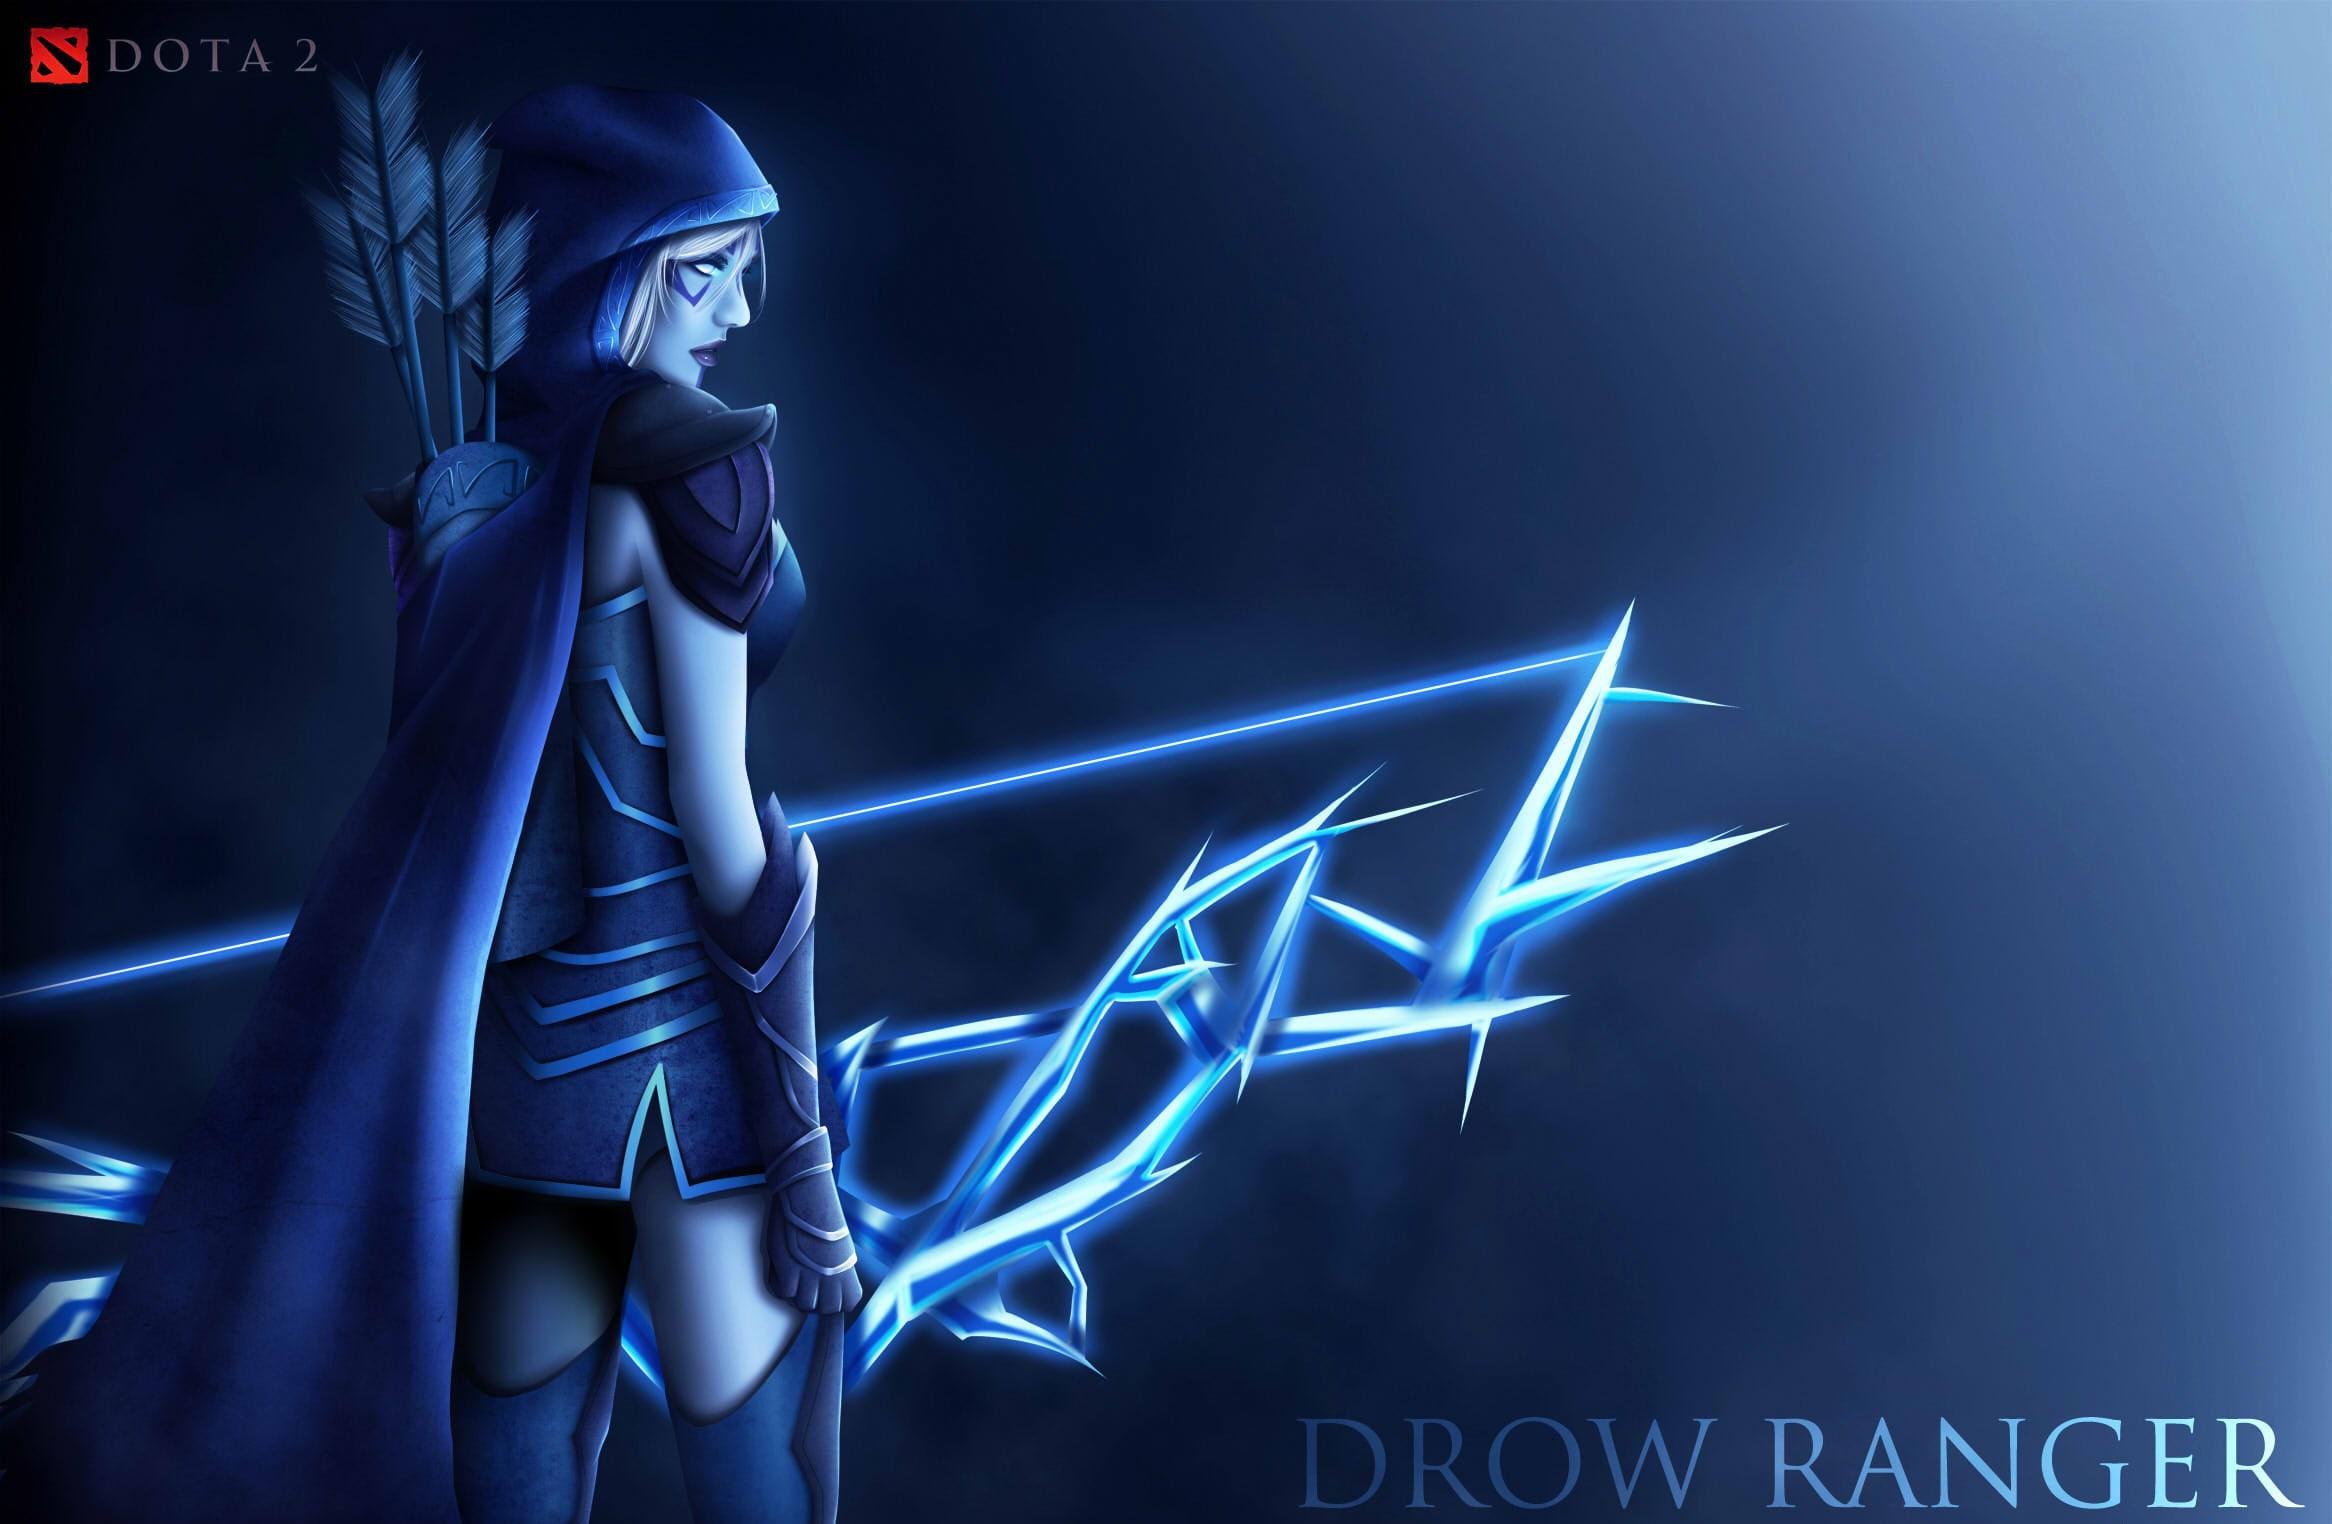 Dota2 : Drow Ranger Wallpapers